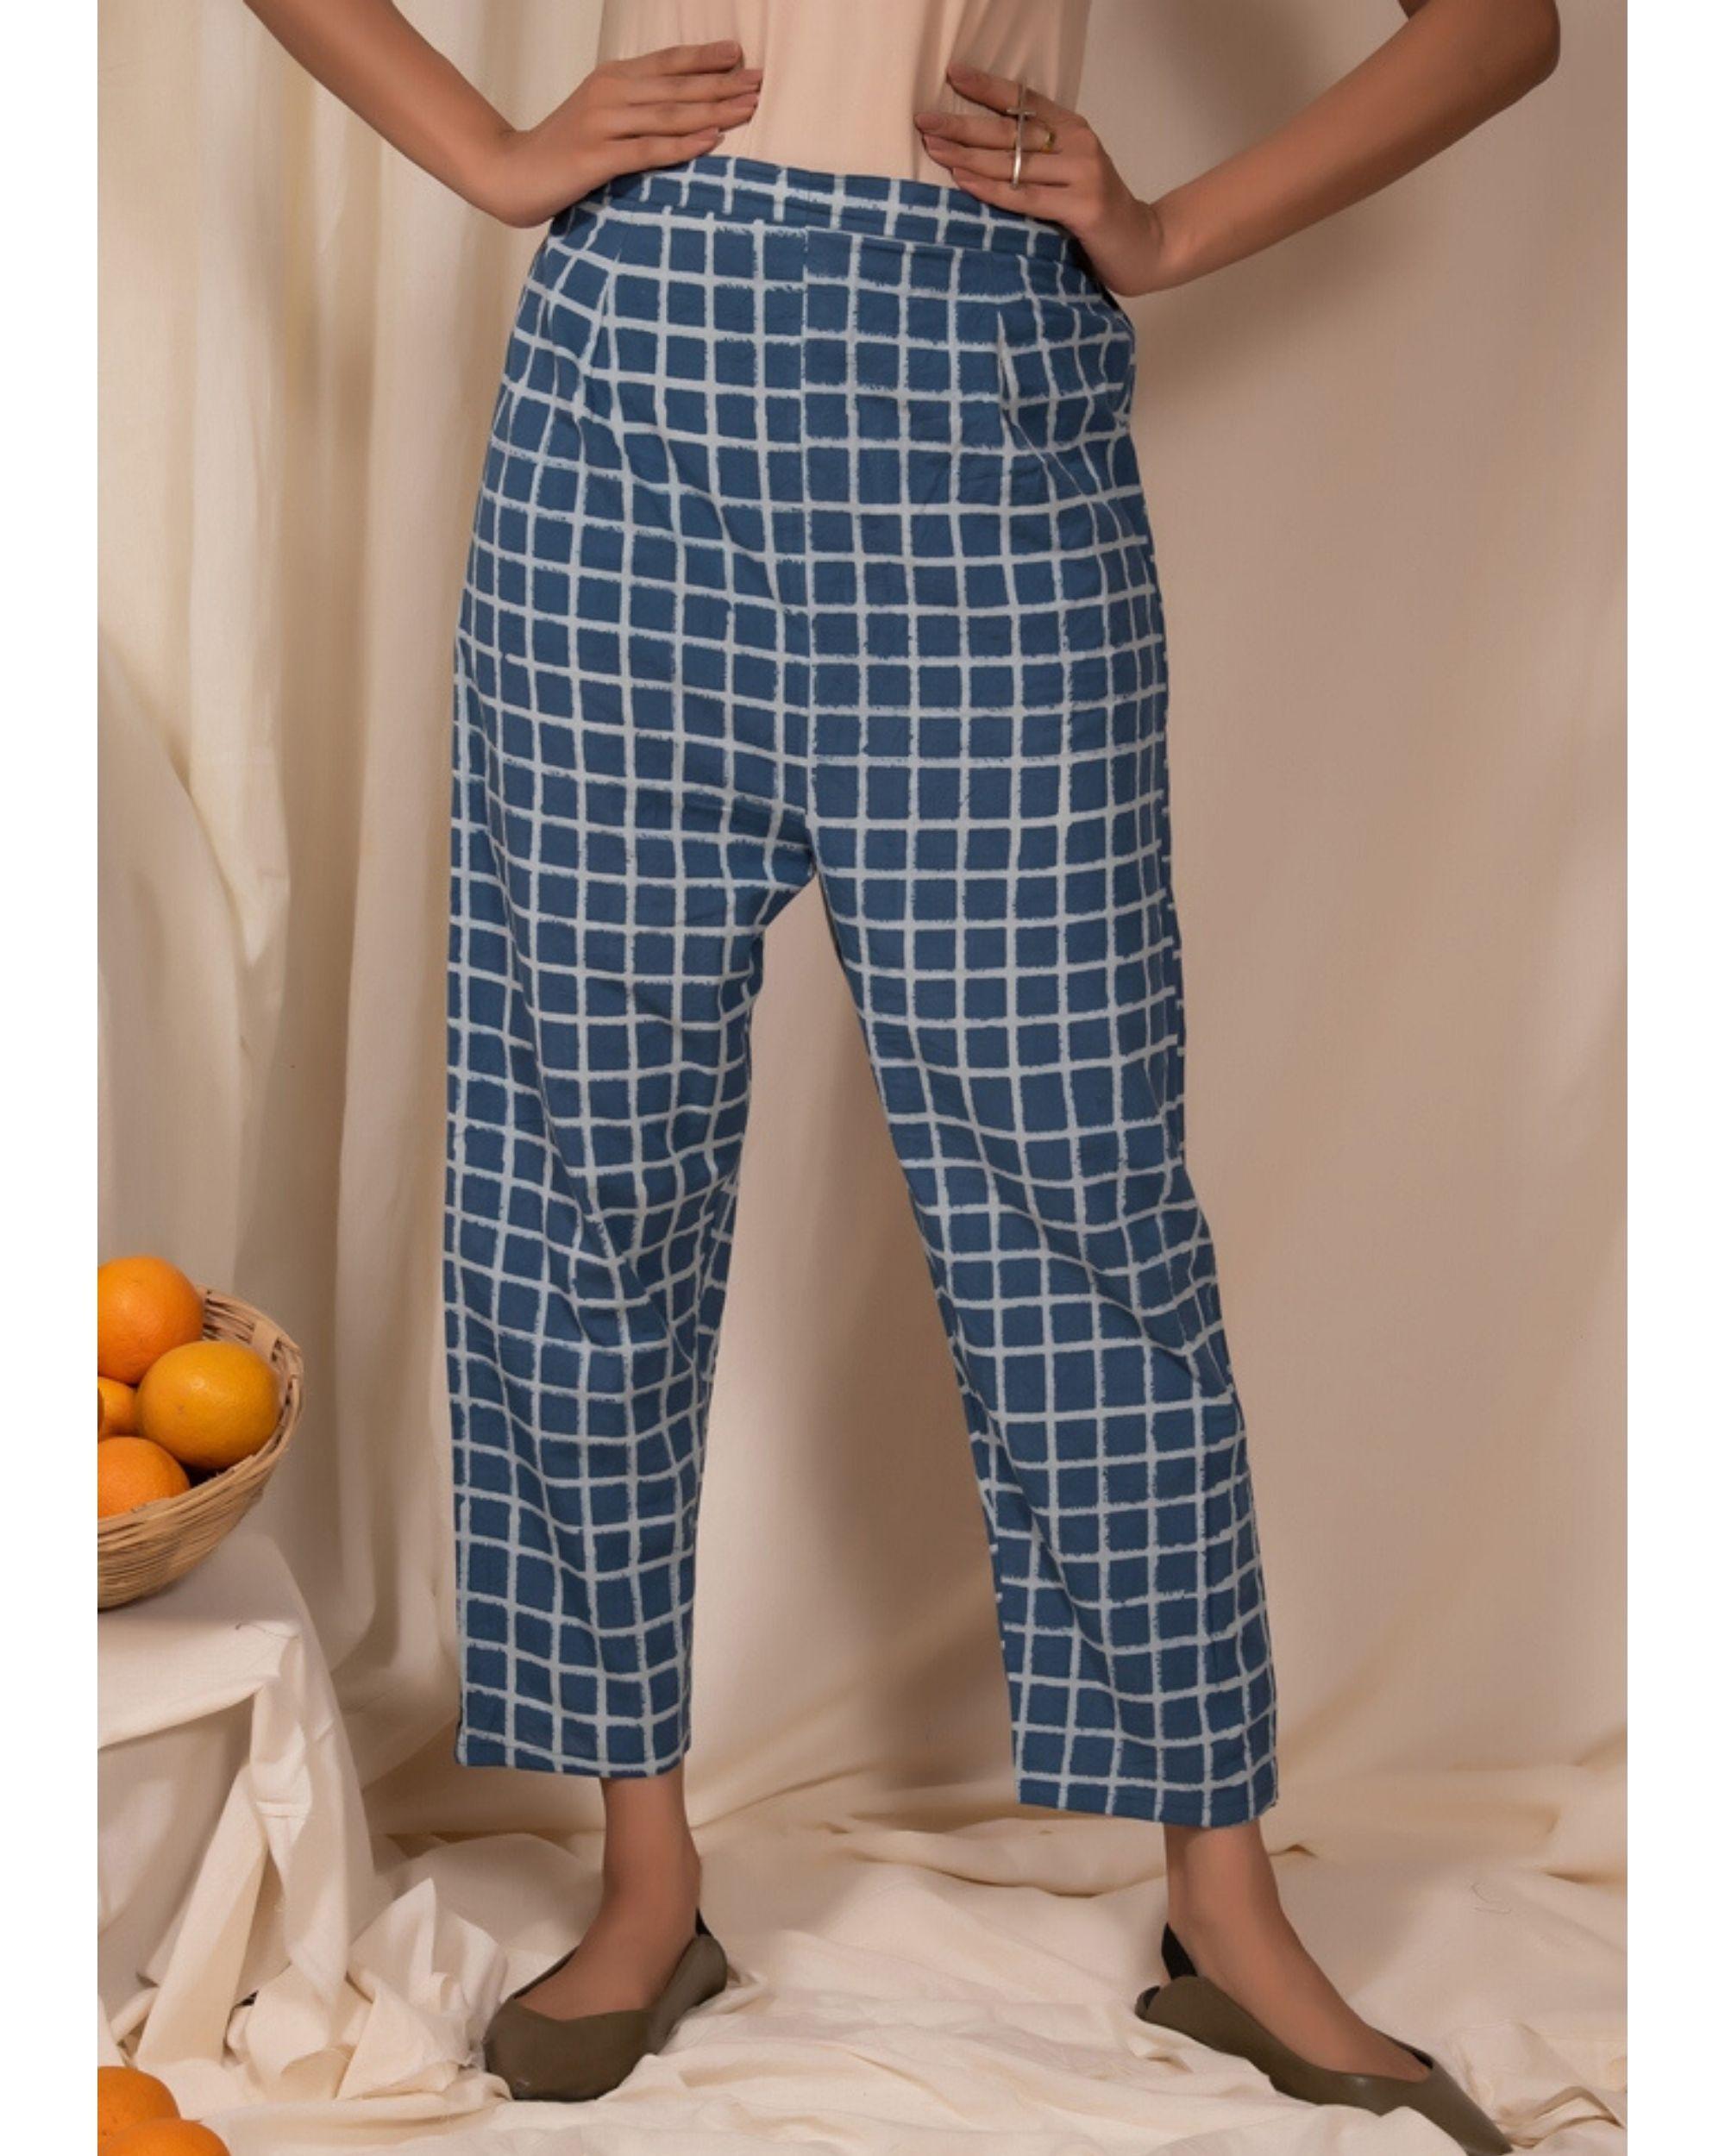 Blue checkered pants